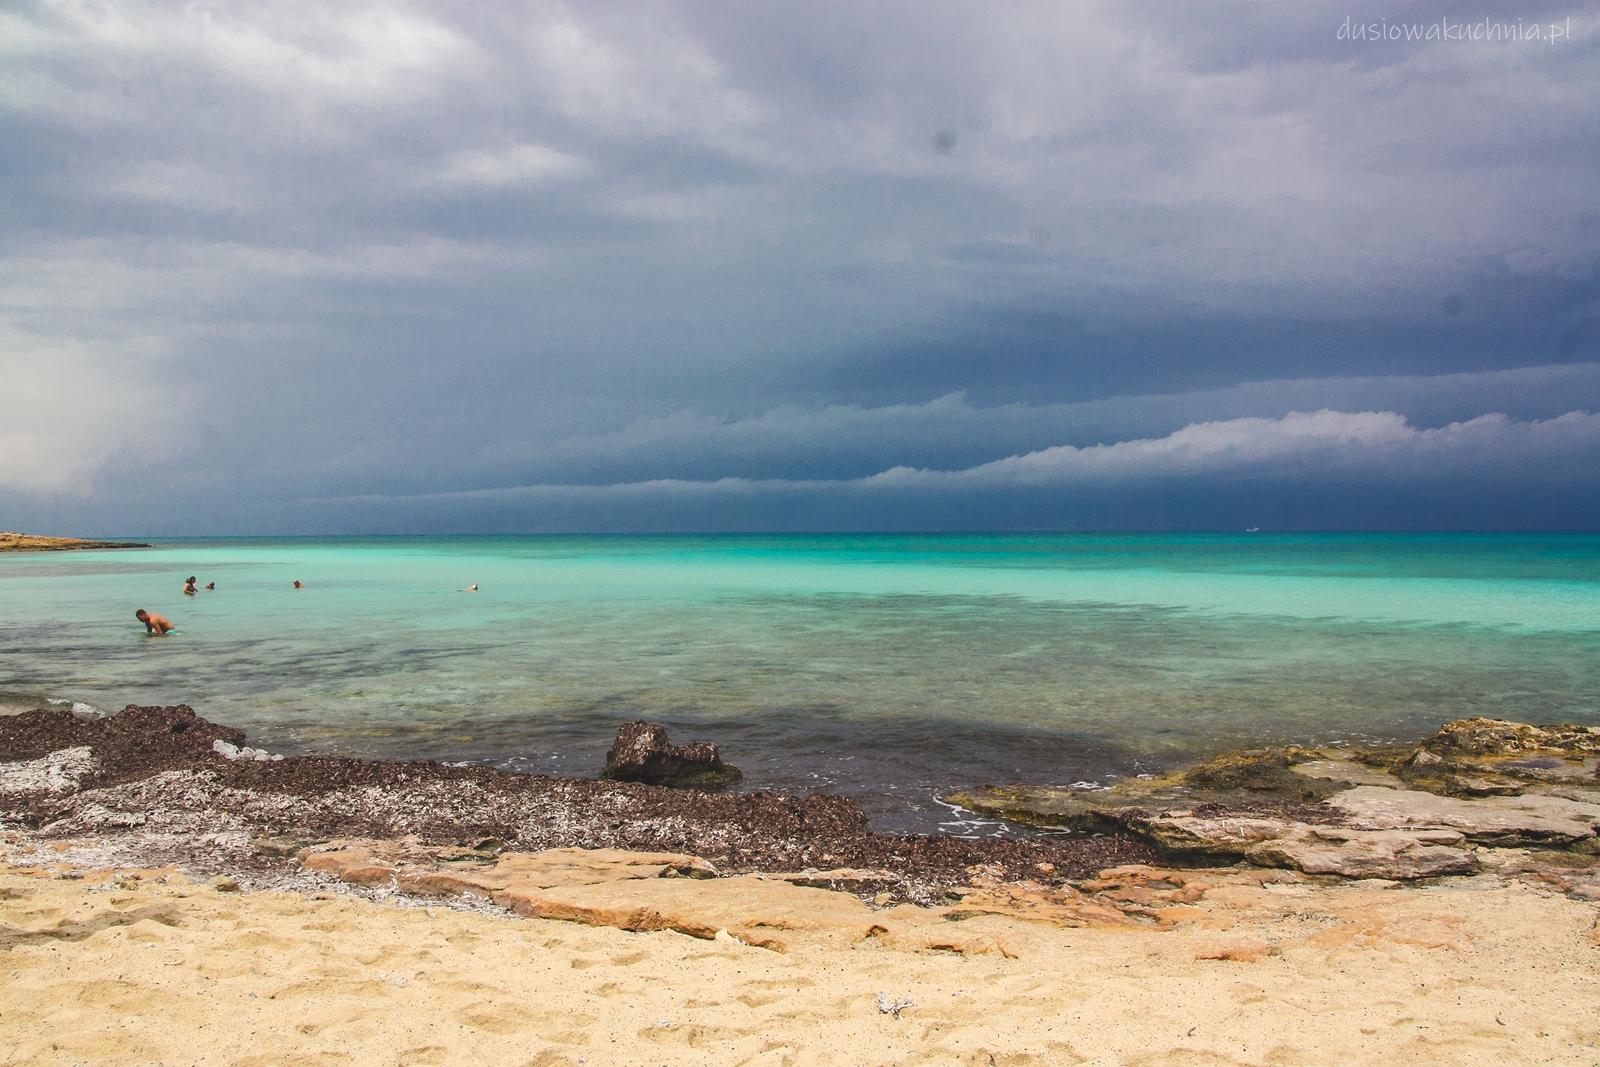 Bezludna rajska złota wyspa Chrissi